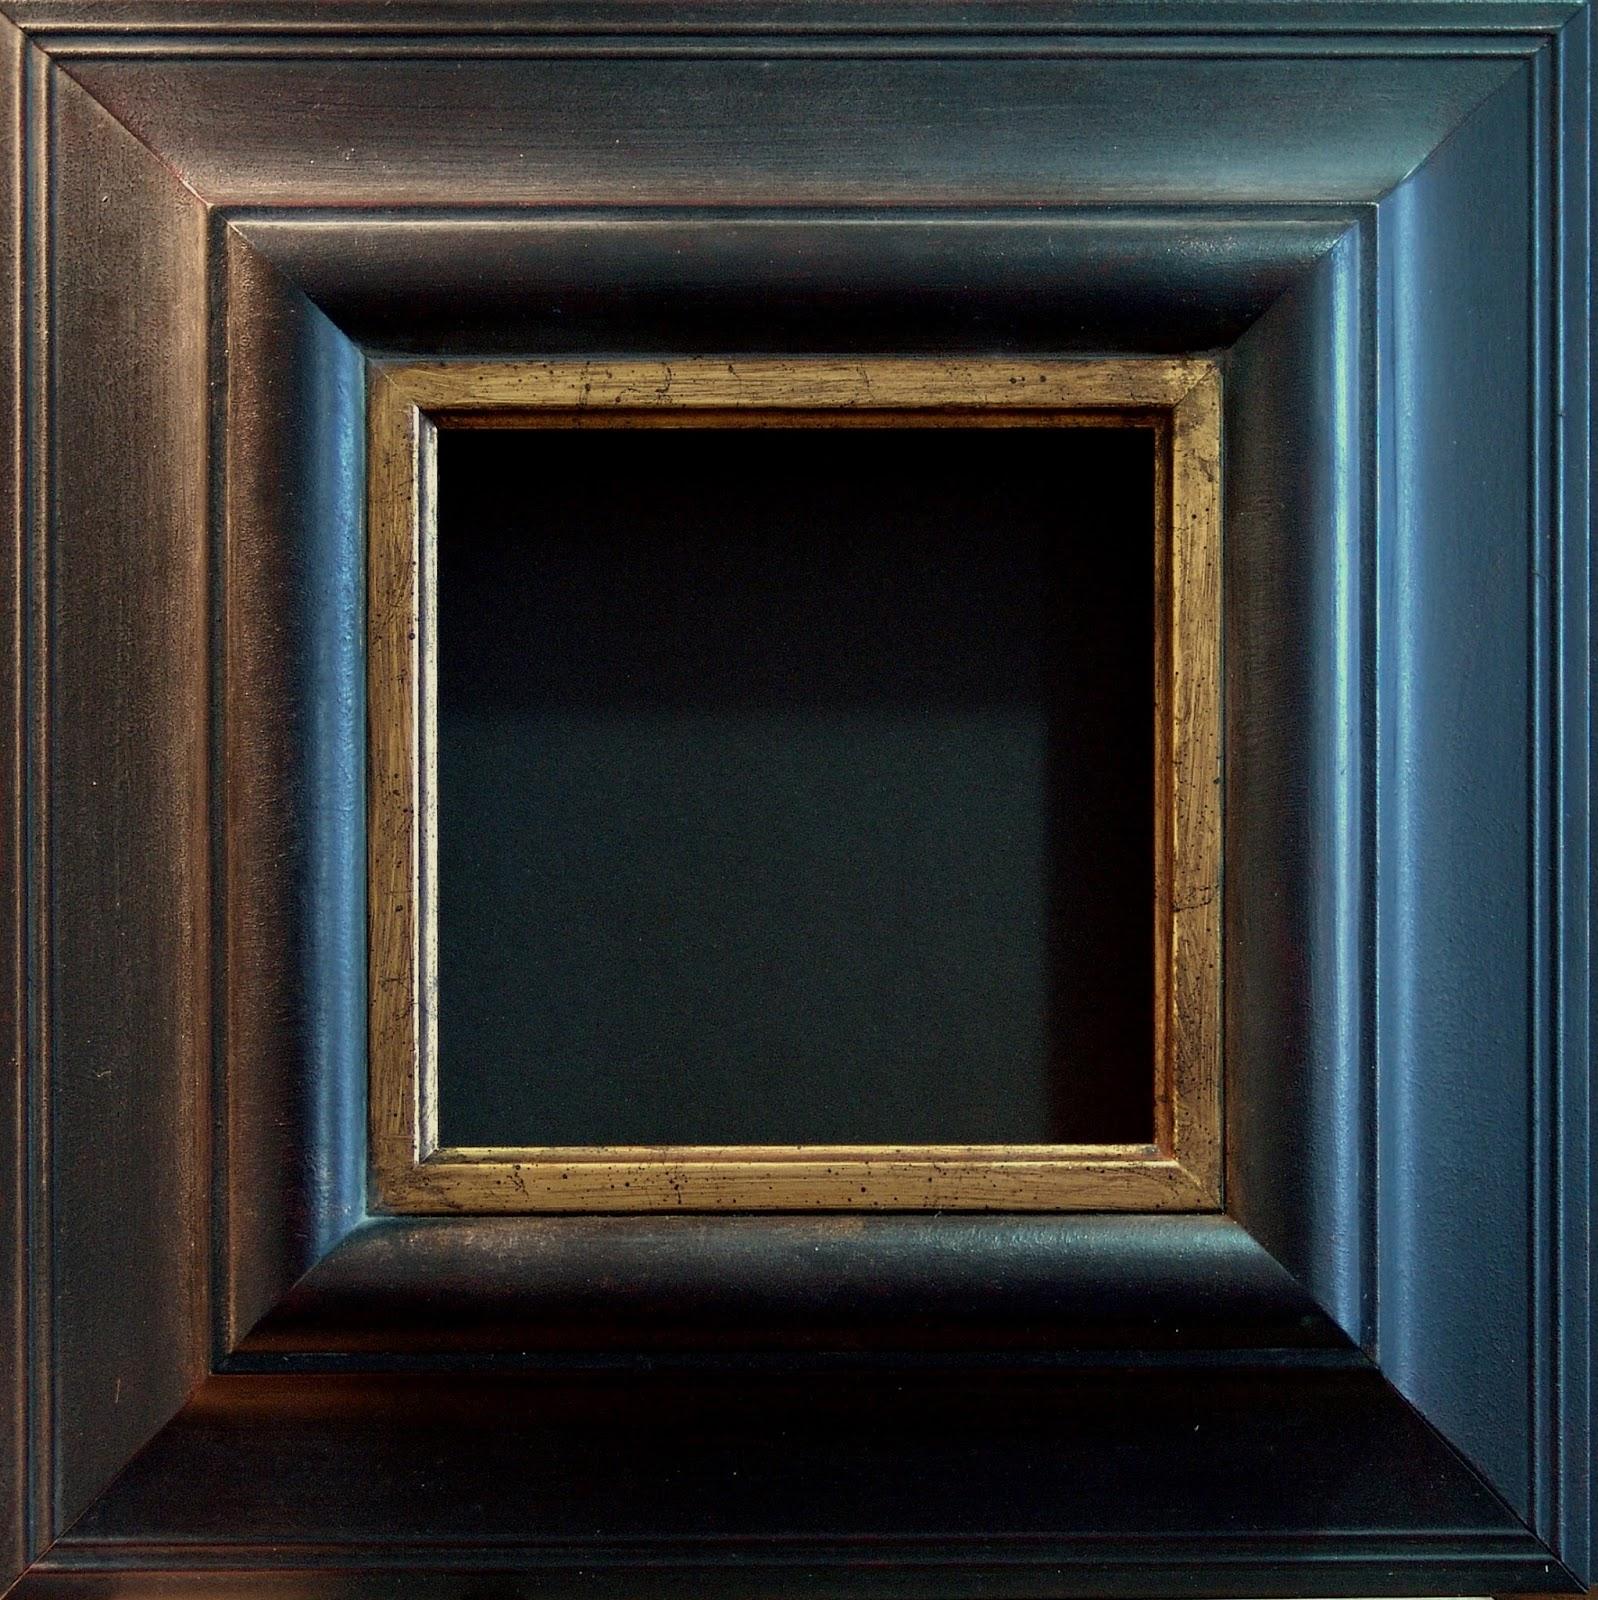 Barbara Schilling: Frame Makeover